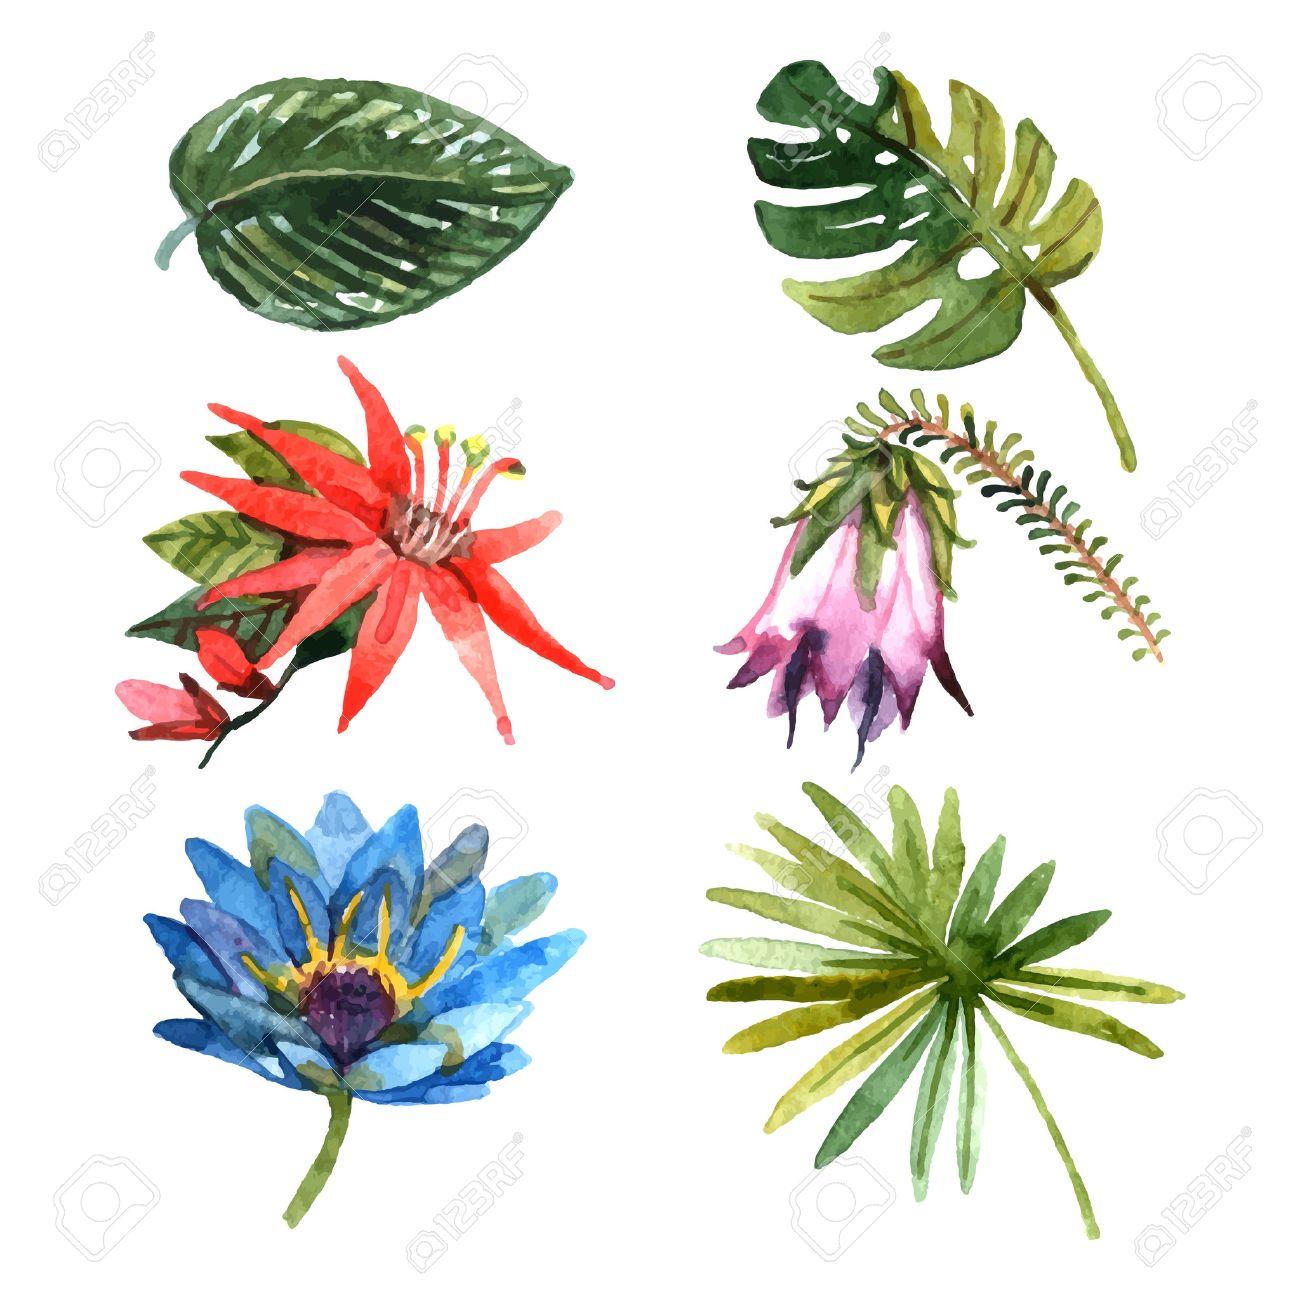 Design#5001577: Tropische pflanzen im garten ? reimplica.info. Garten Ideen Tropisch Exotisch Bilder